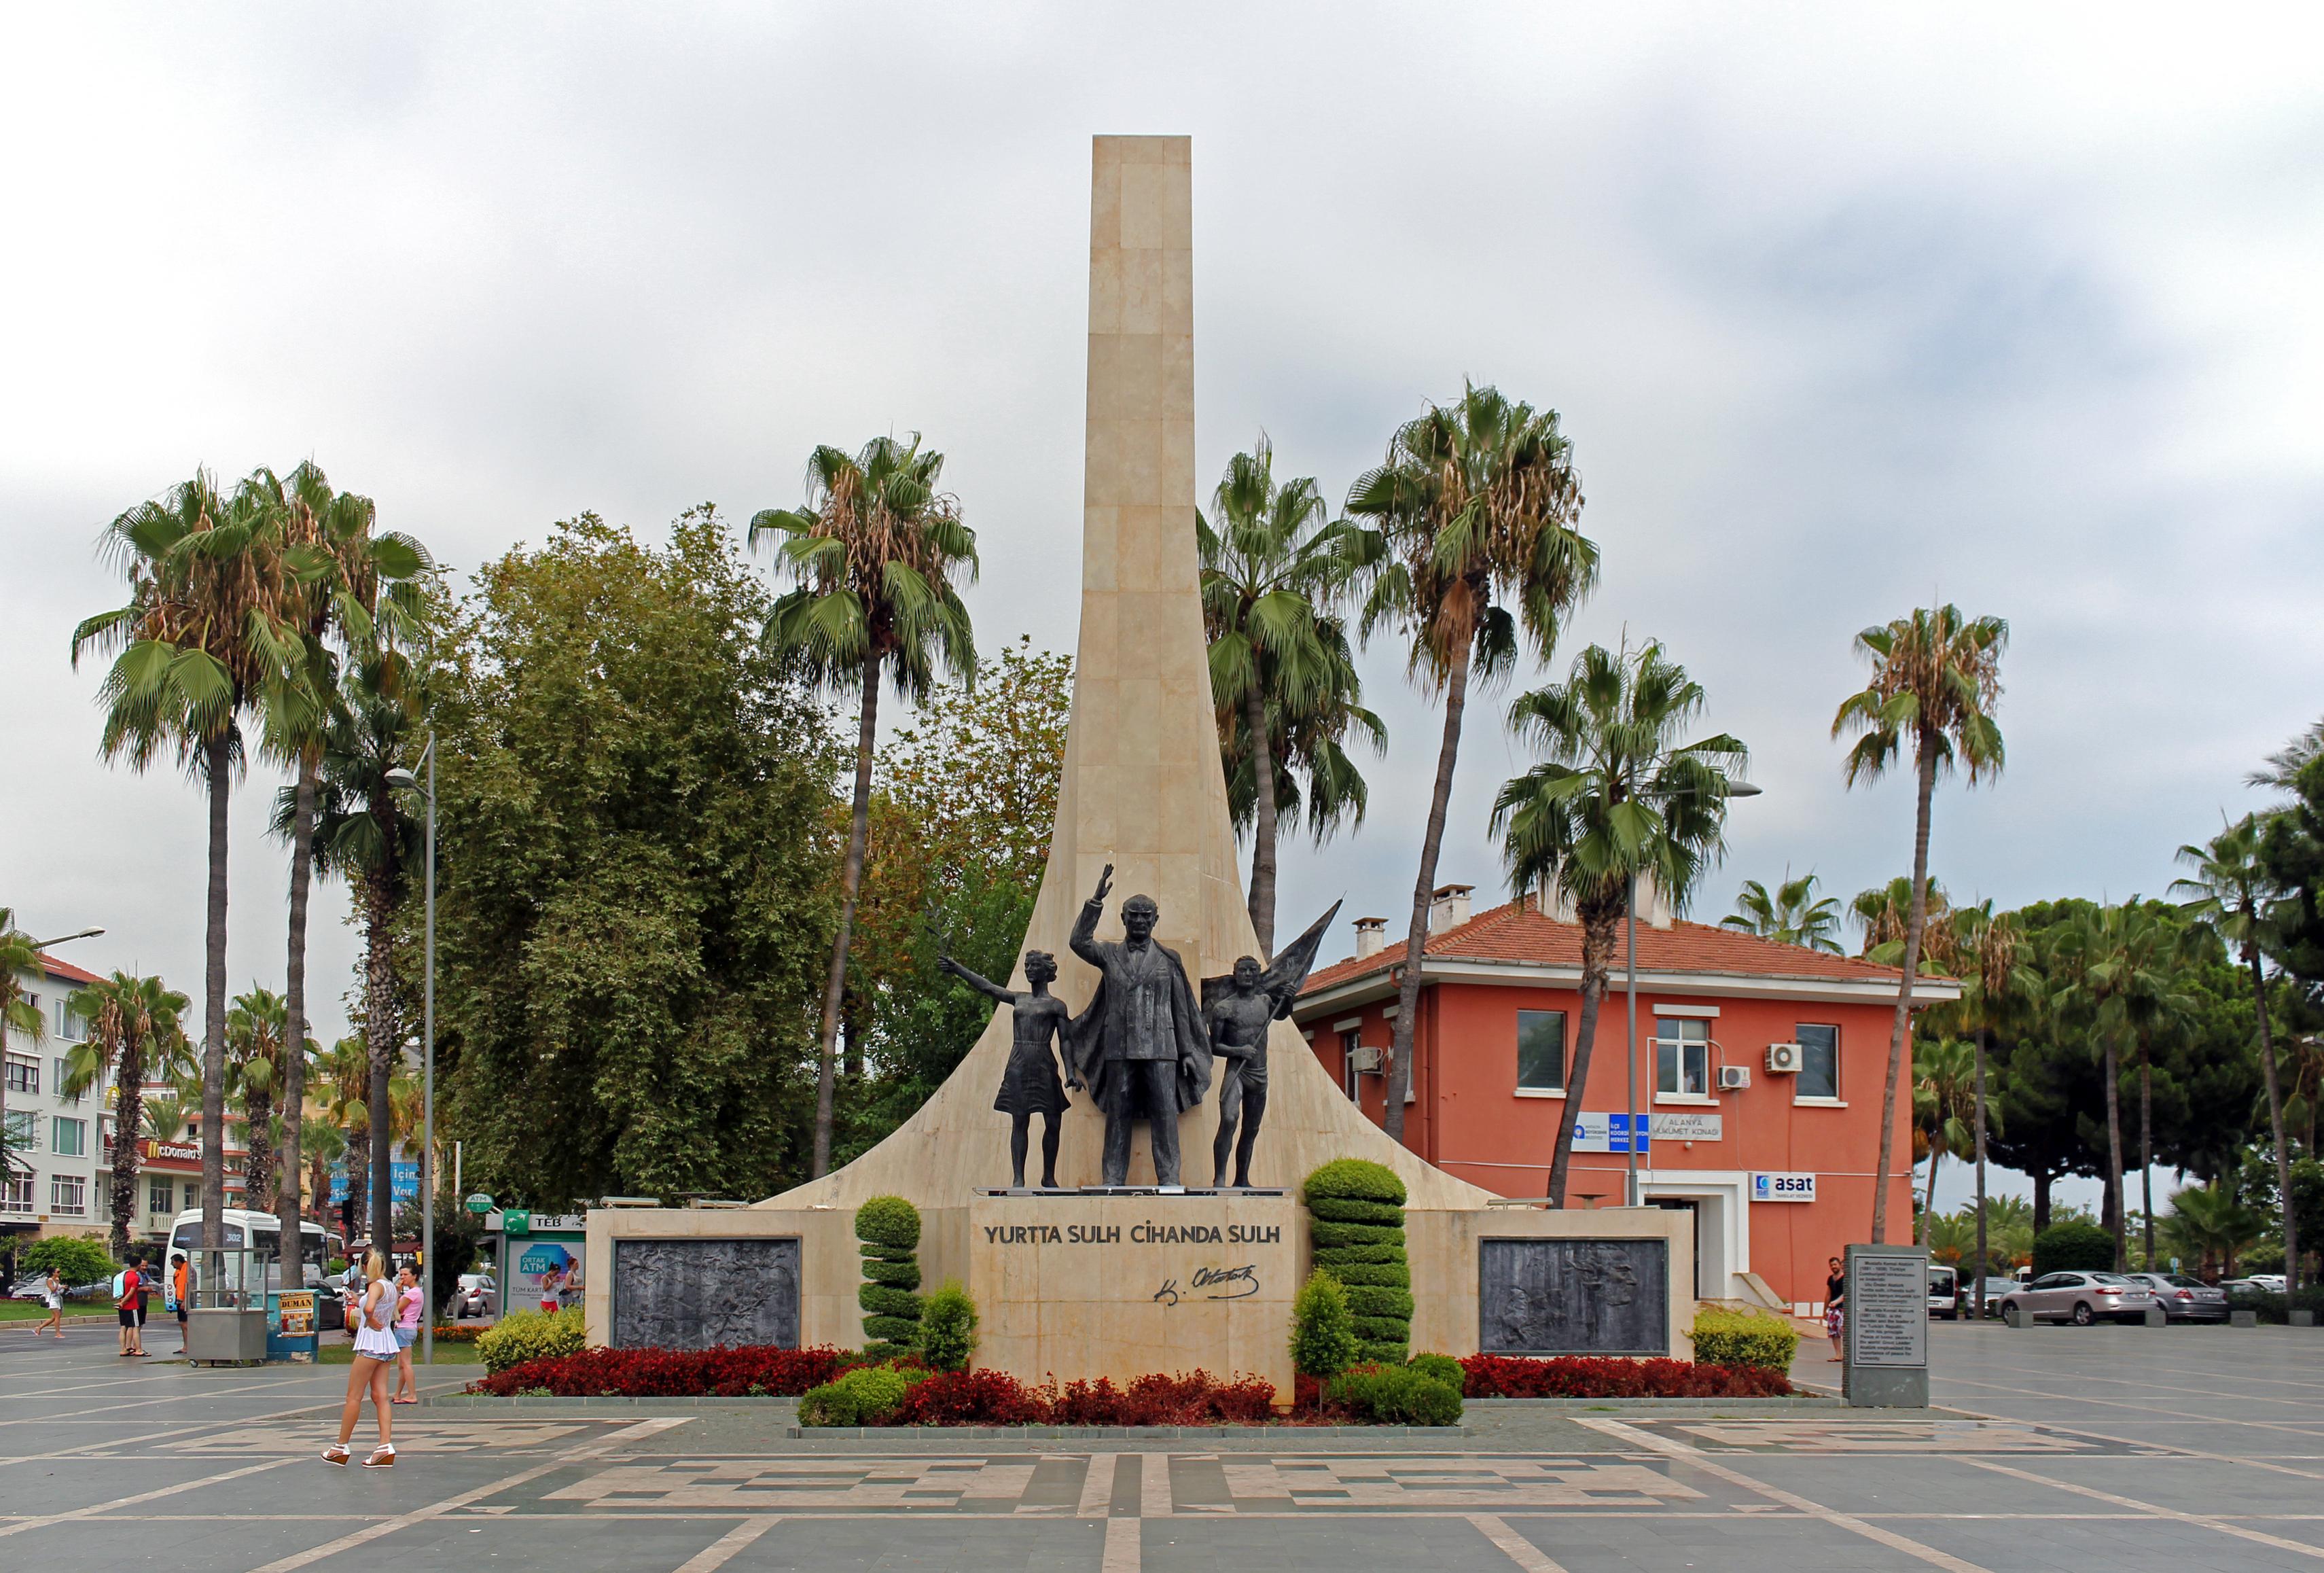 File:Alanya. Monument to Mustafa Kemal Atatürk.jpg - Wikimedia Commons